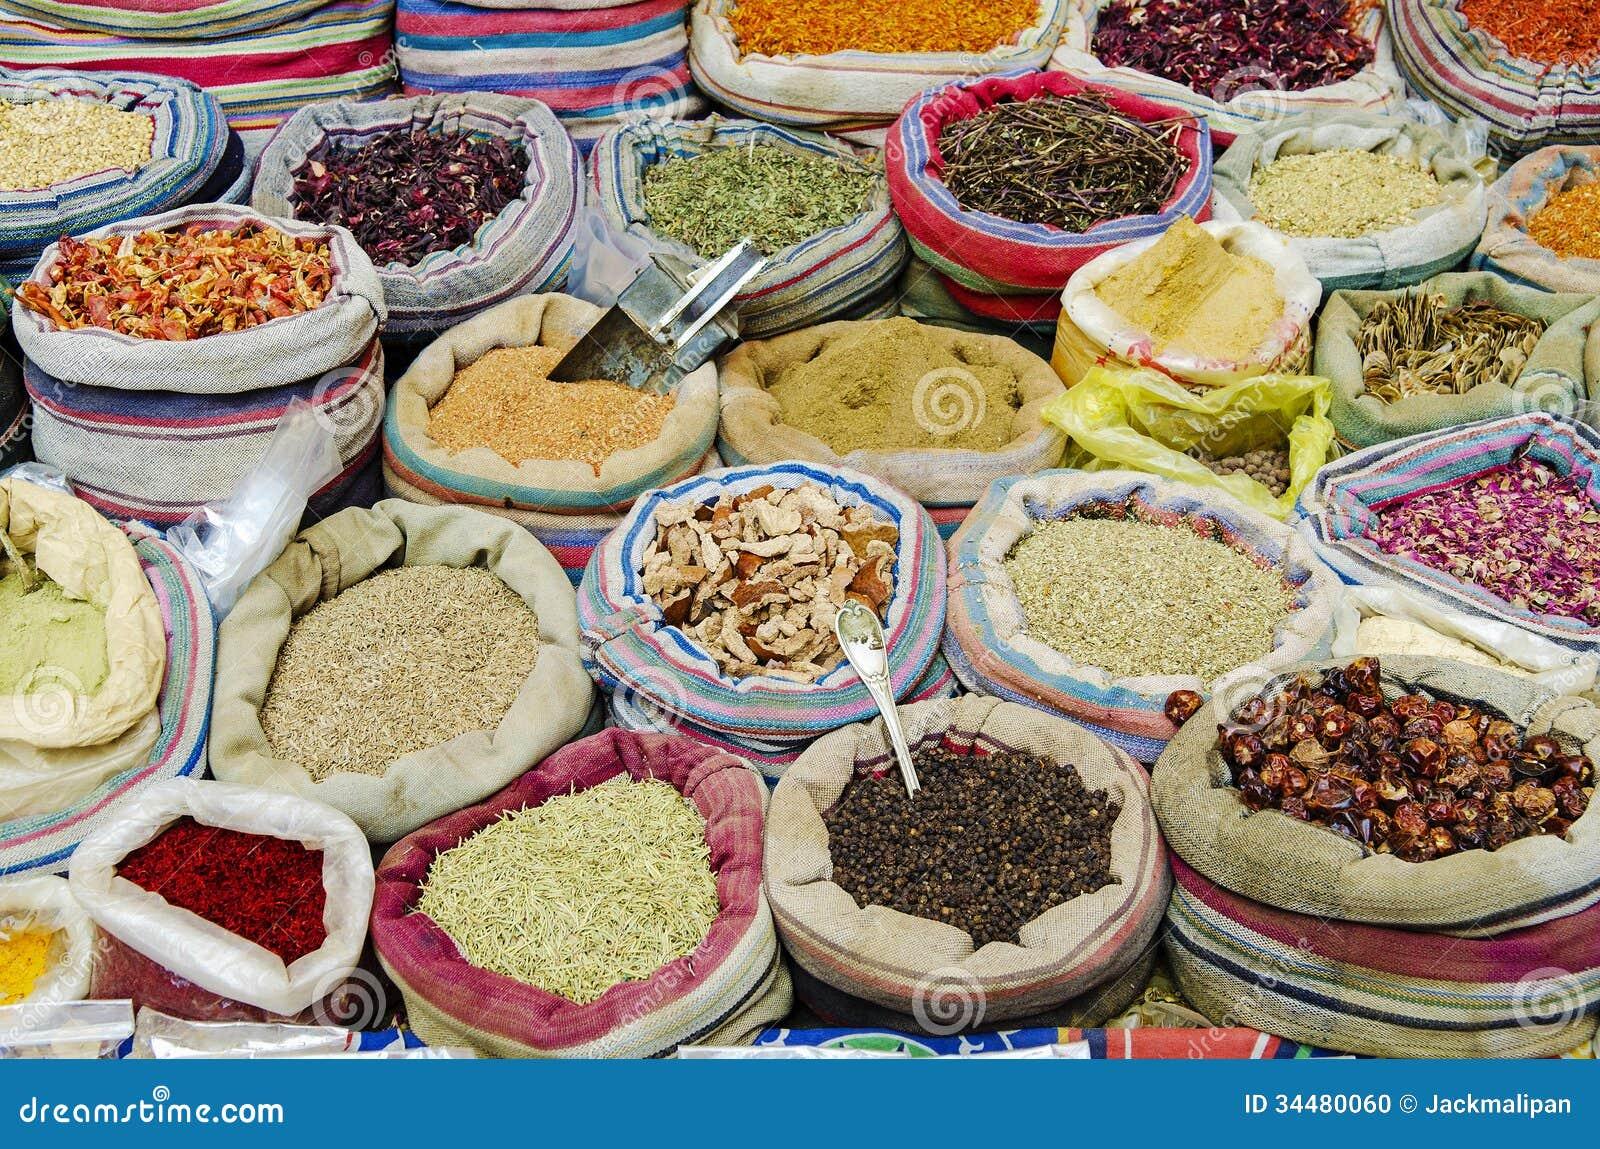 Cairo Street Market Food